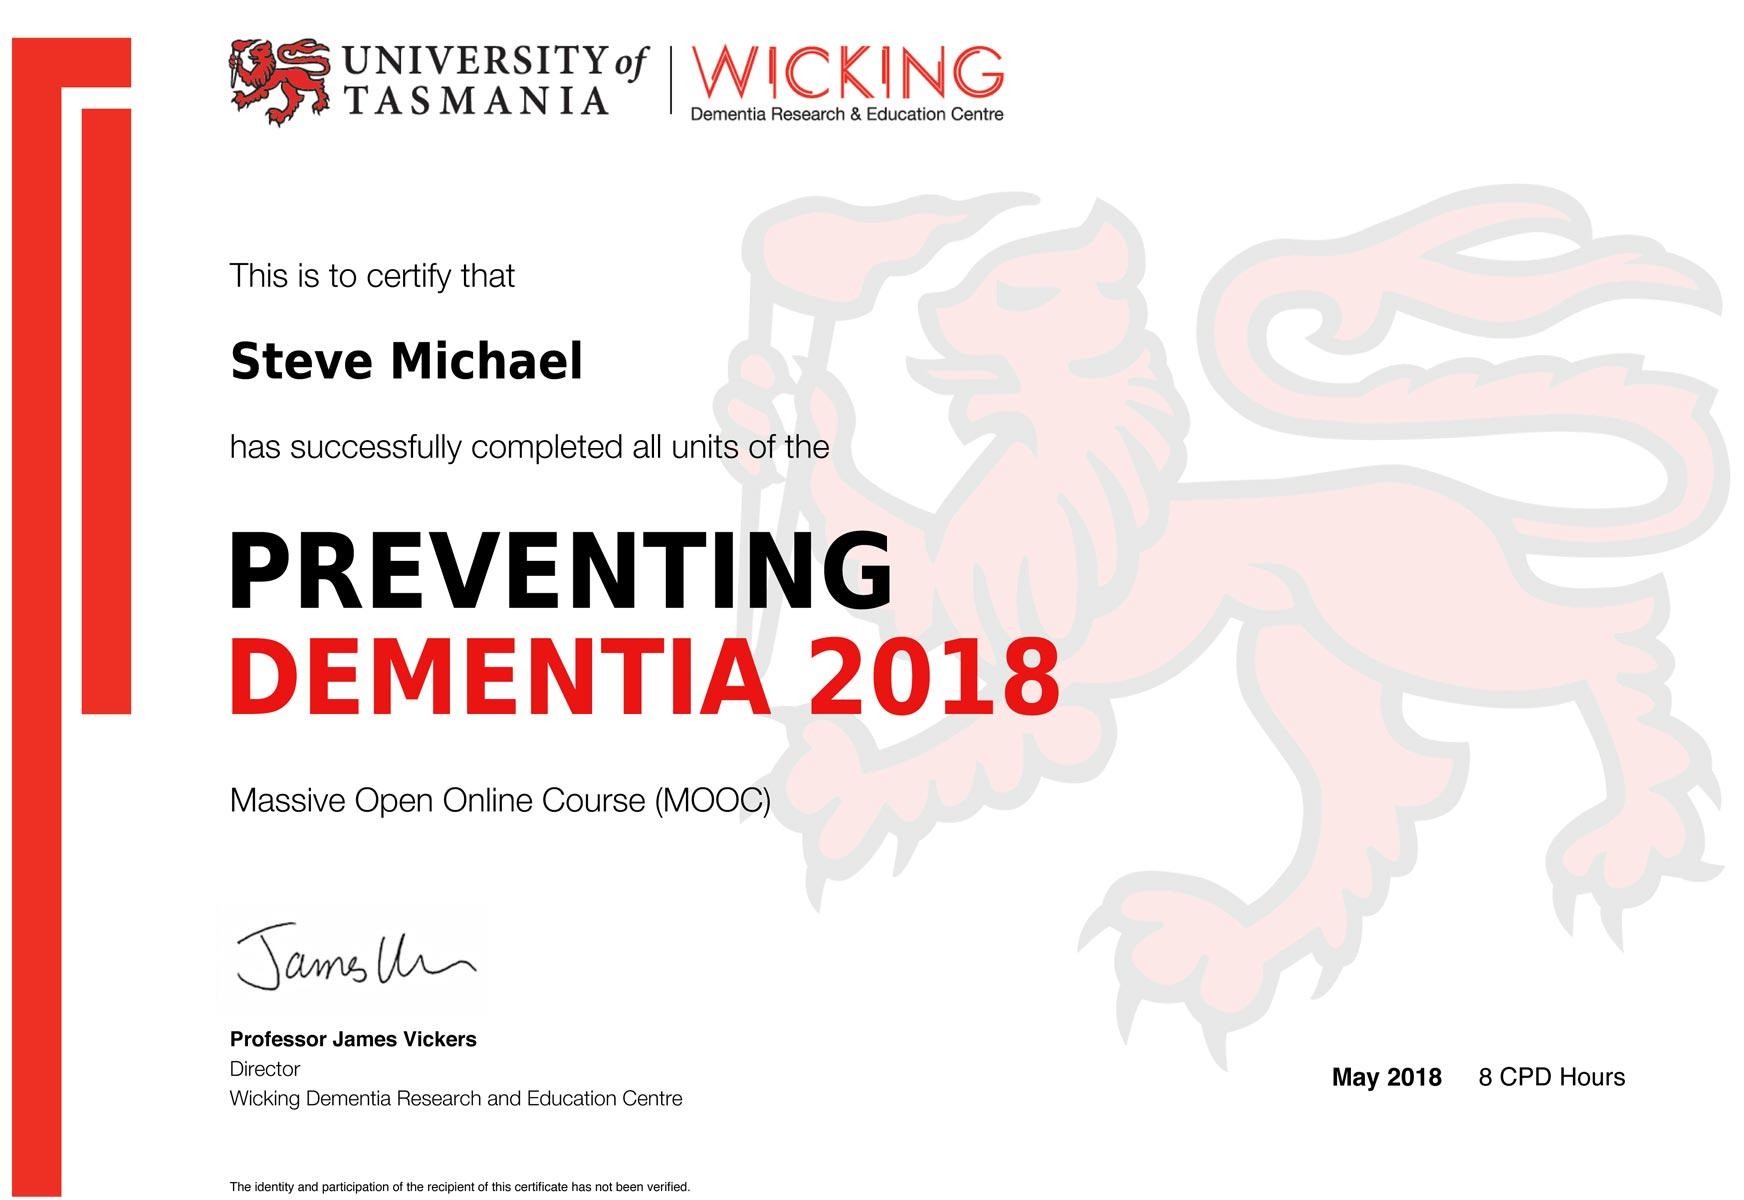 Steve Michael Has Studied Dementia Awareness Courses To Inform His